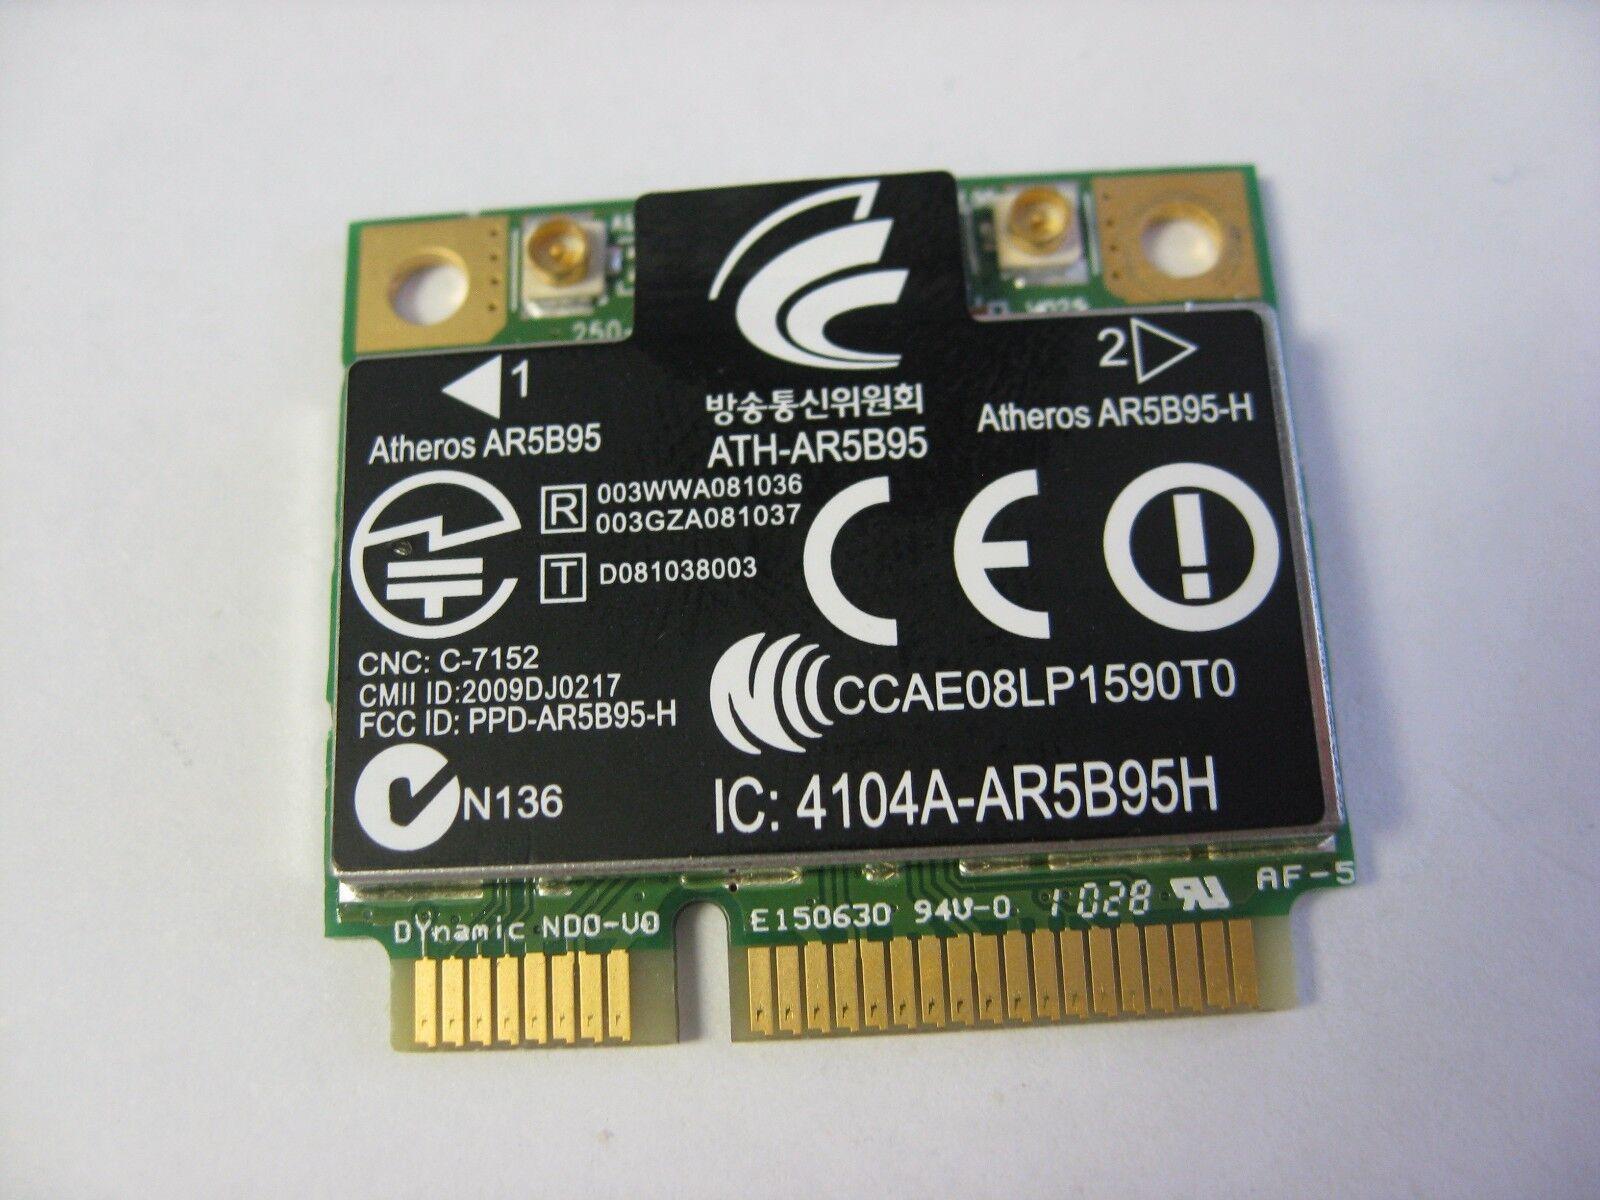 USB 2.0 Wireless WiFi Lan Card for HP-Compaq Presario SR5250CF